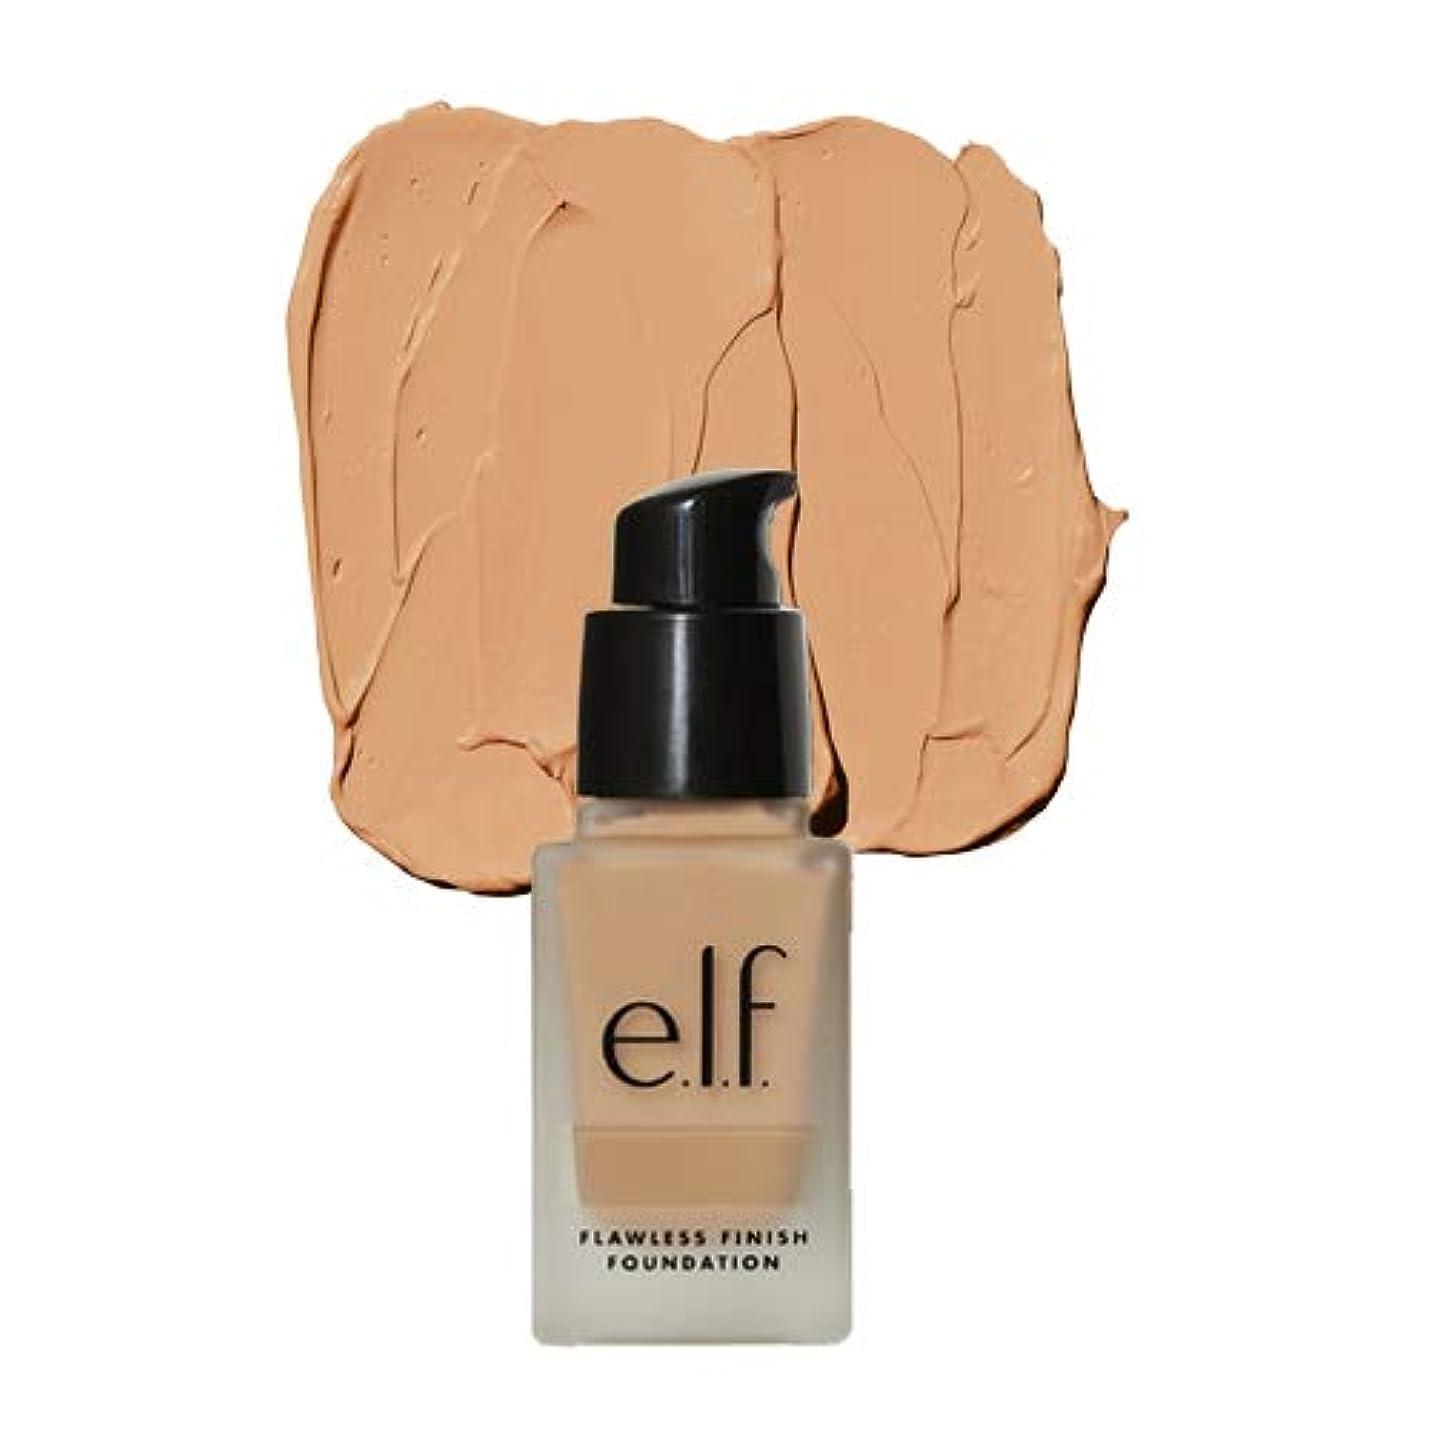 e.l.f. Oil Free Flawless Finish Foundation - Toffee (並行輸入品)